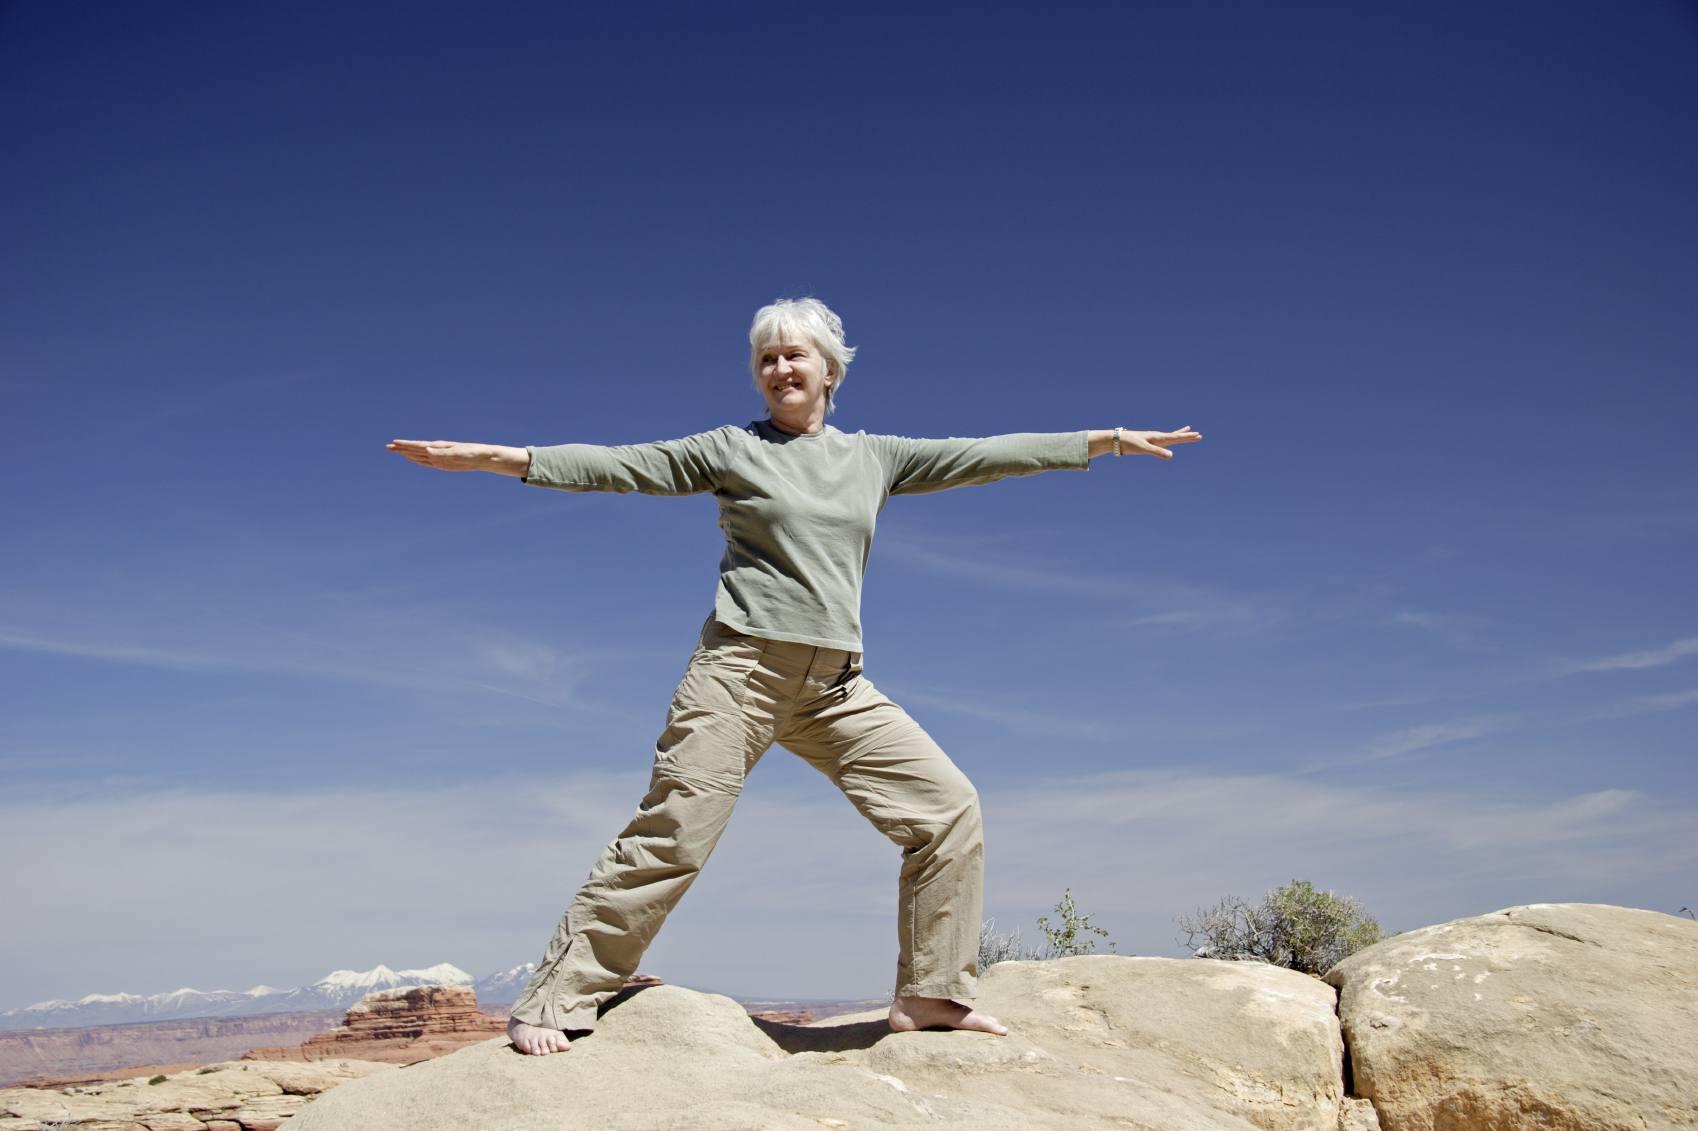 Losing Balance? Falls? Don't Fear!